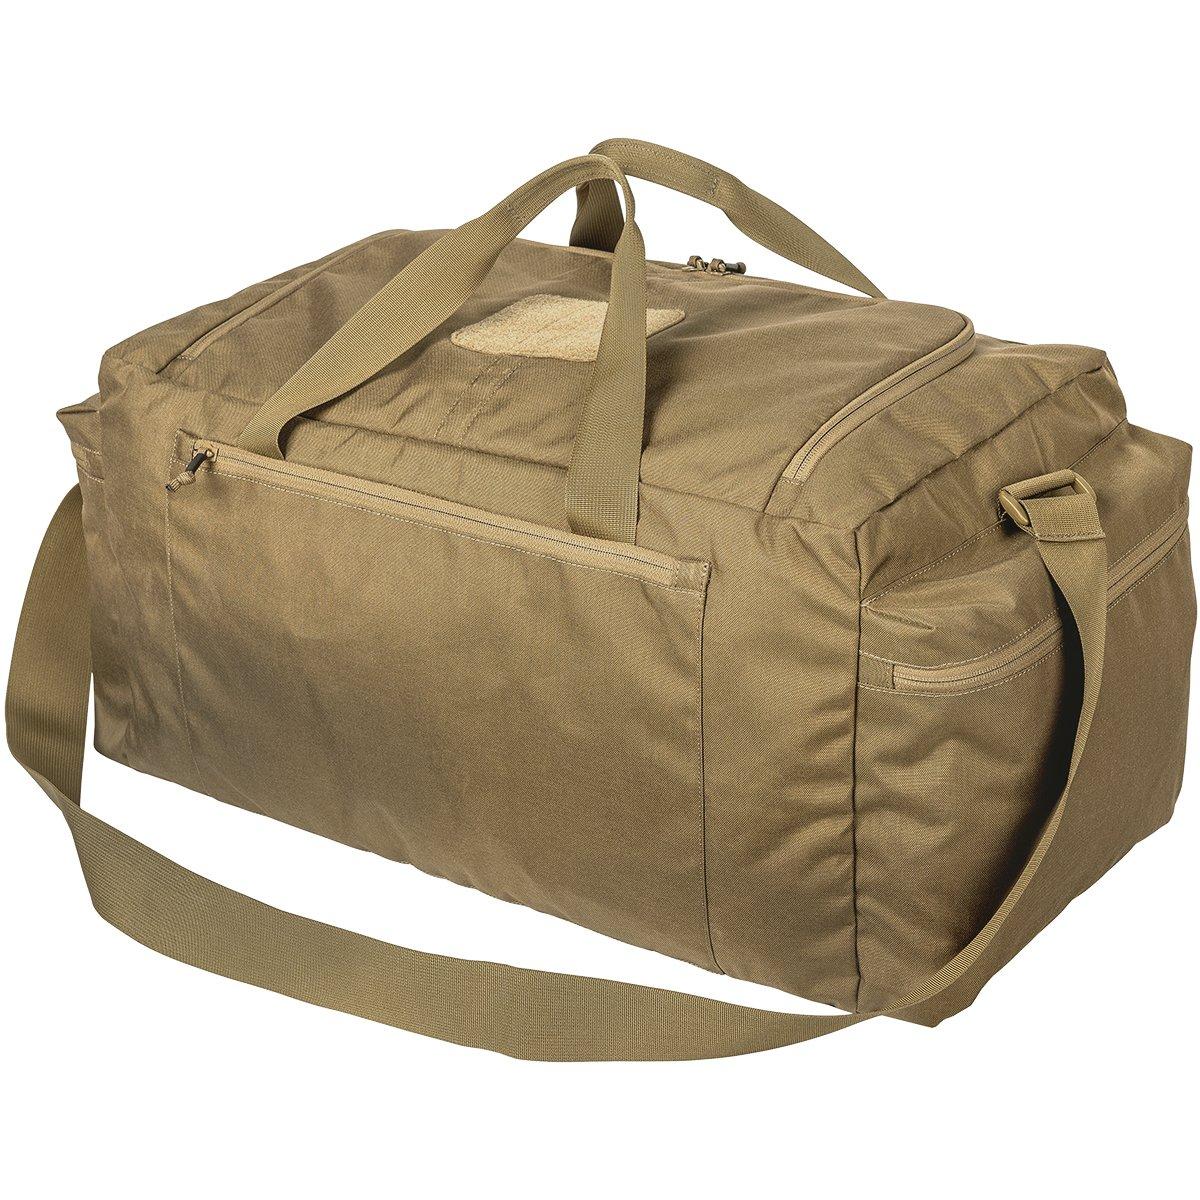 HELIKON-TEX Range Line, Urban Training Bag Coyote